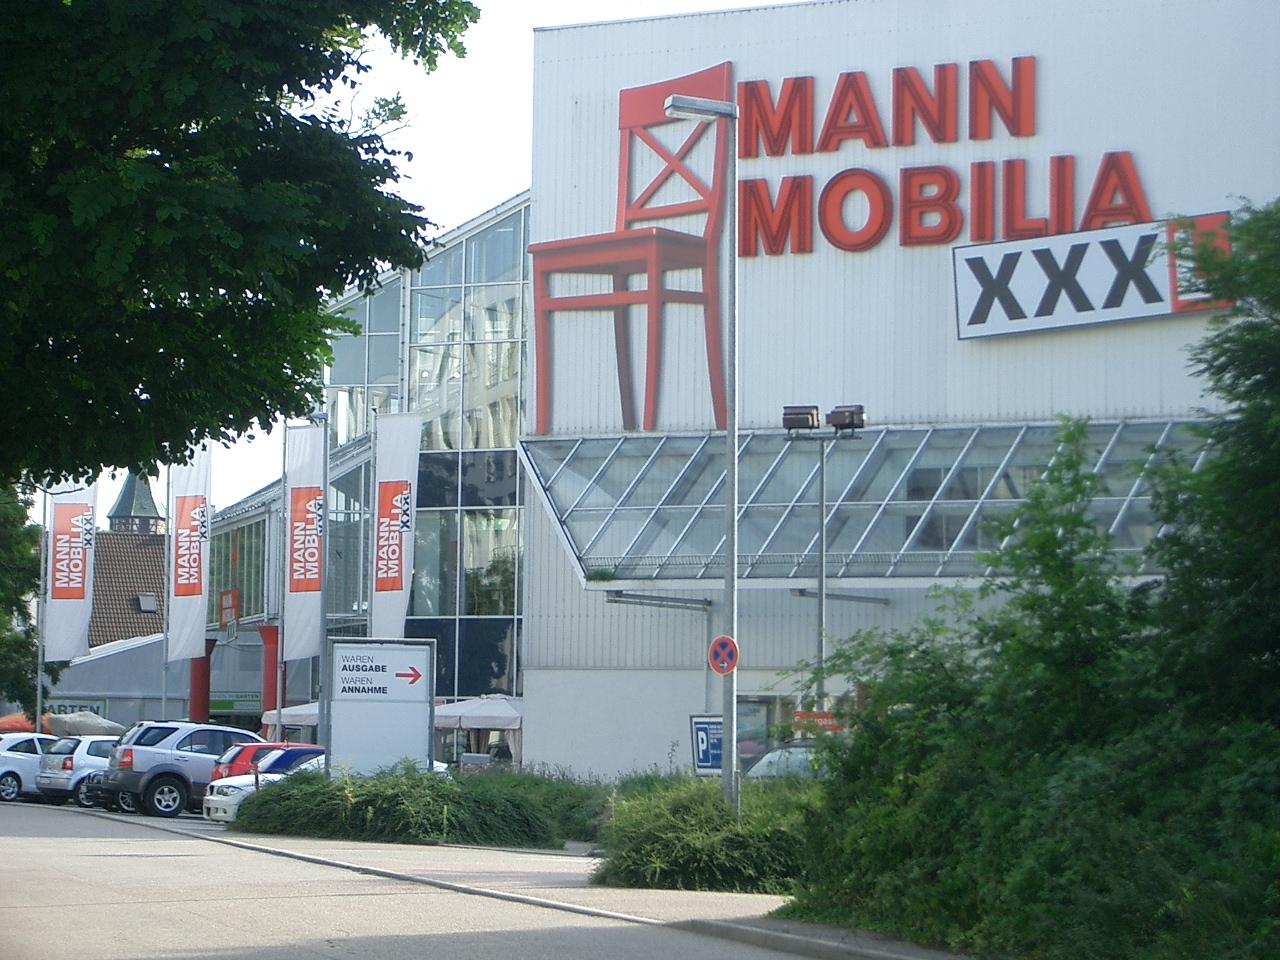 Xxxl Mann Mobilia Ludwigsburg Möbelhandel 71634 Ludwigsburg